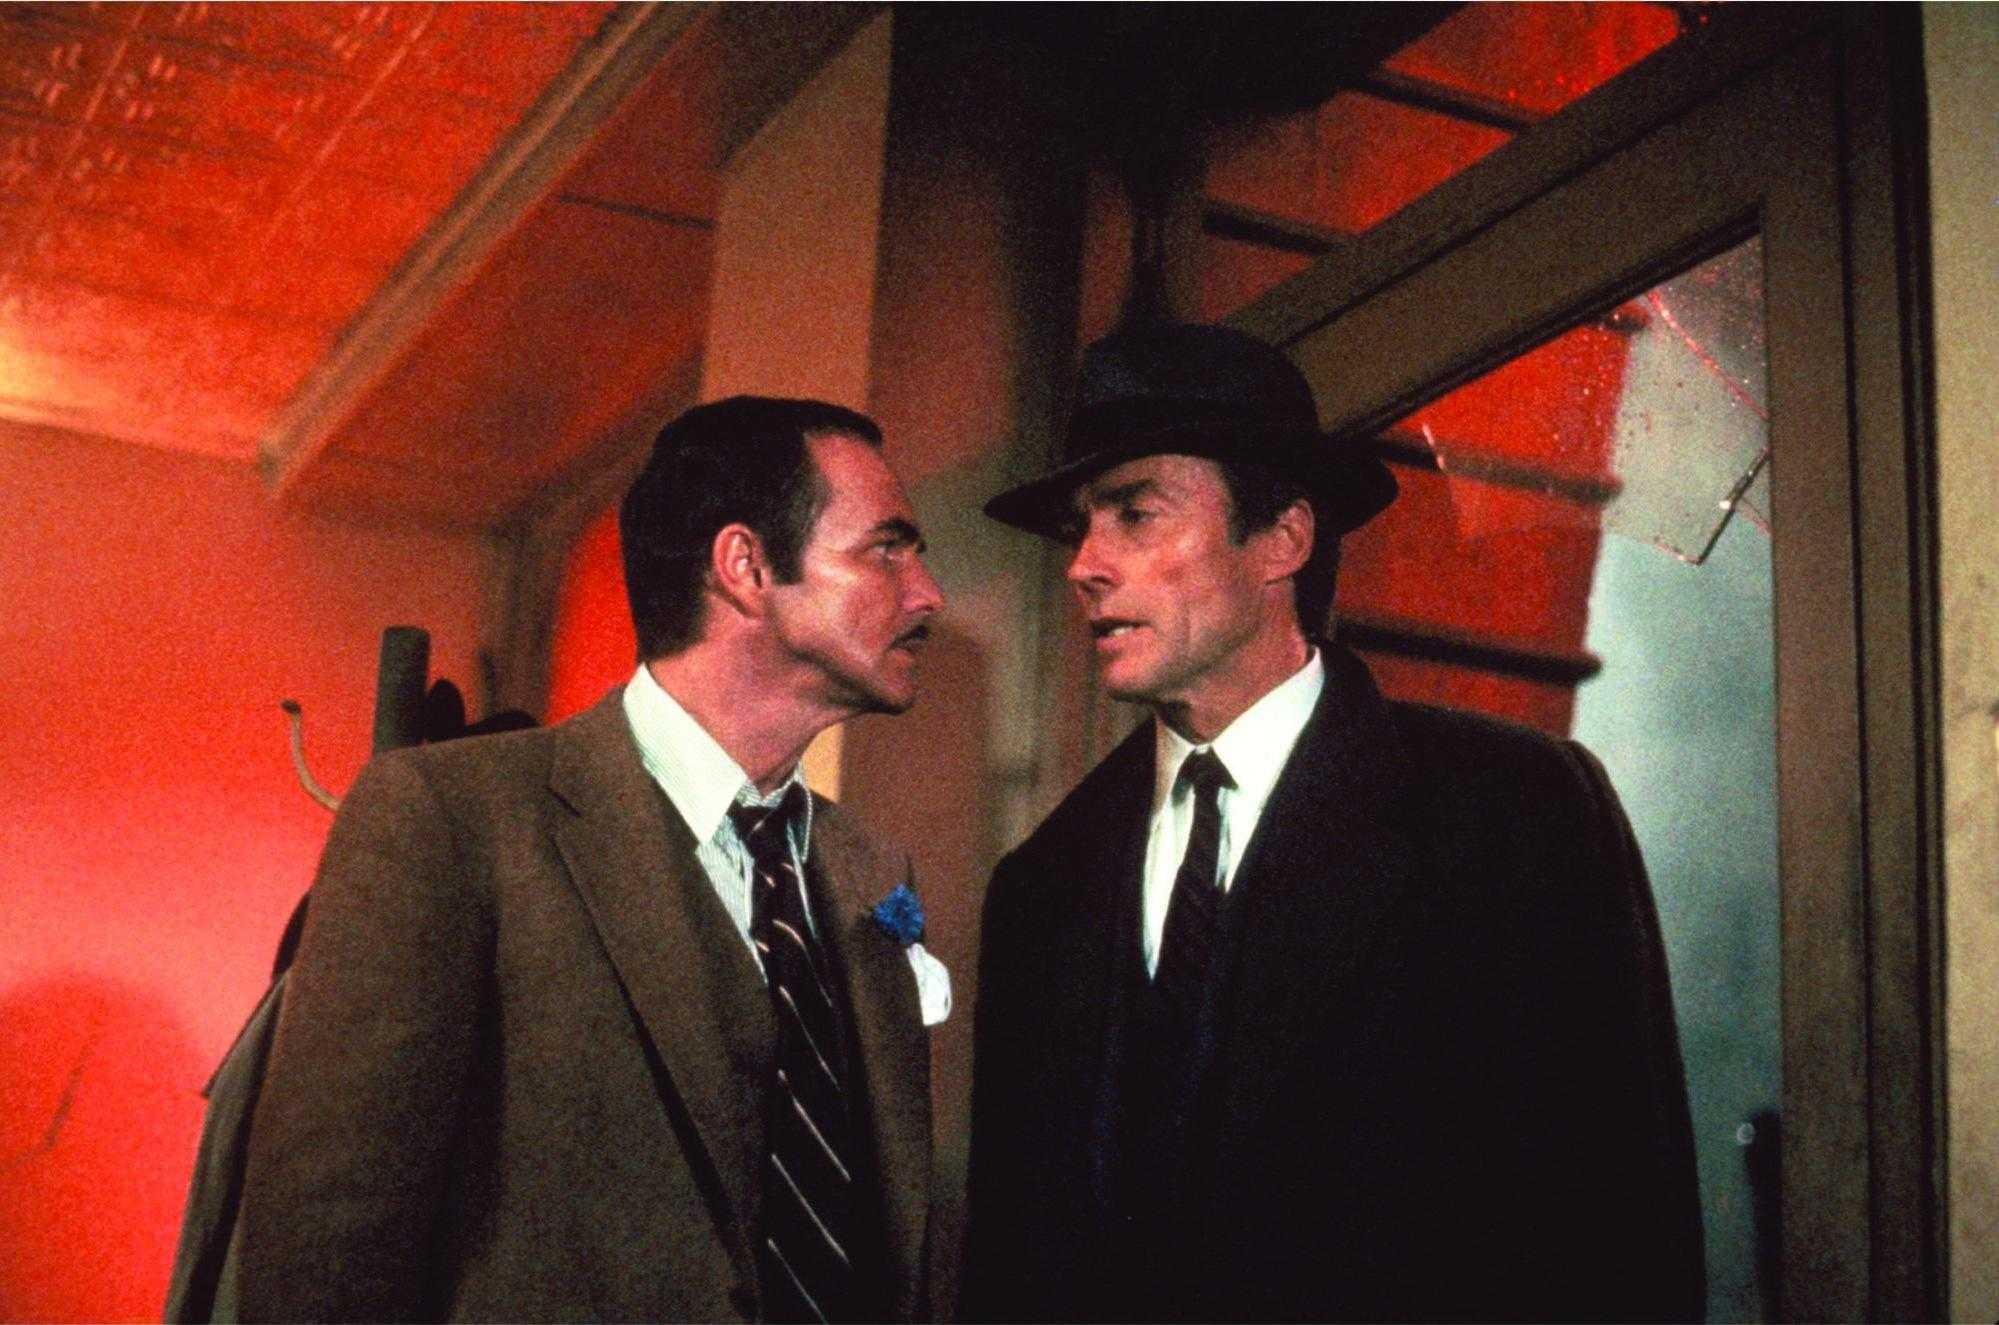 Burt Reynolds, Clint Eastwood City Heat